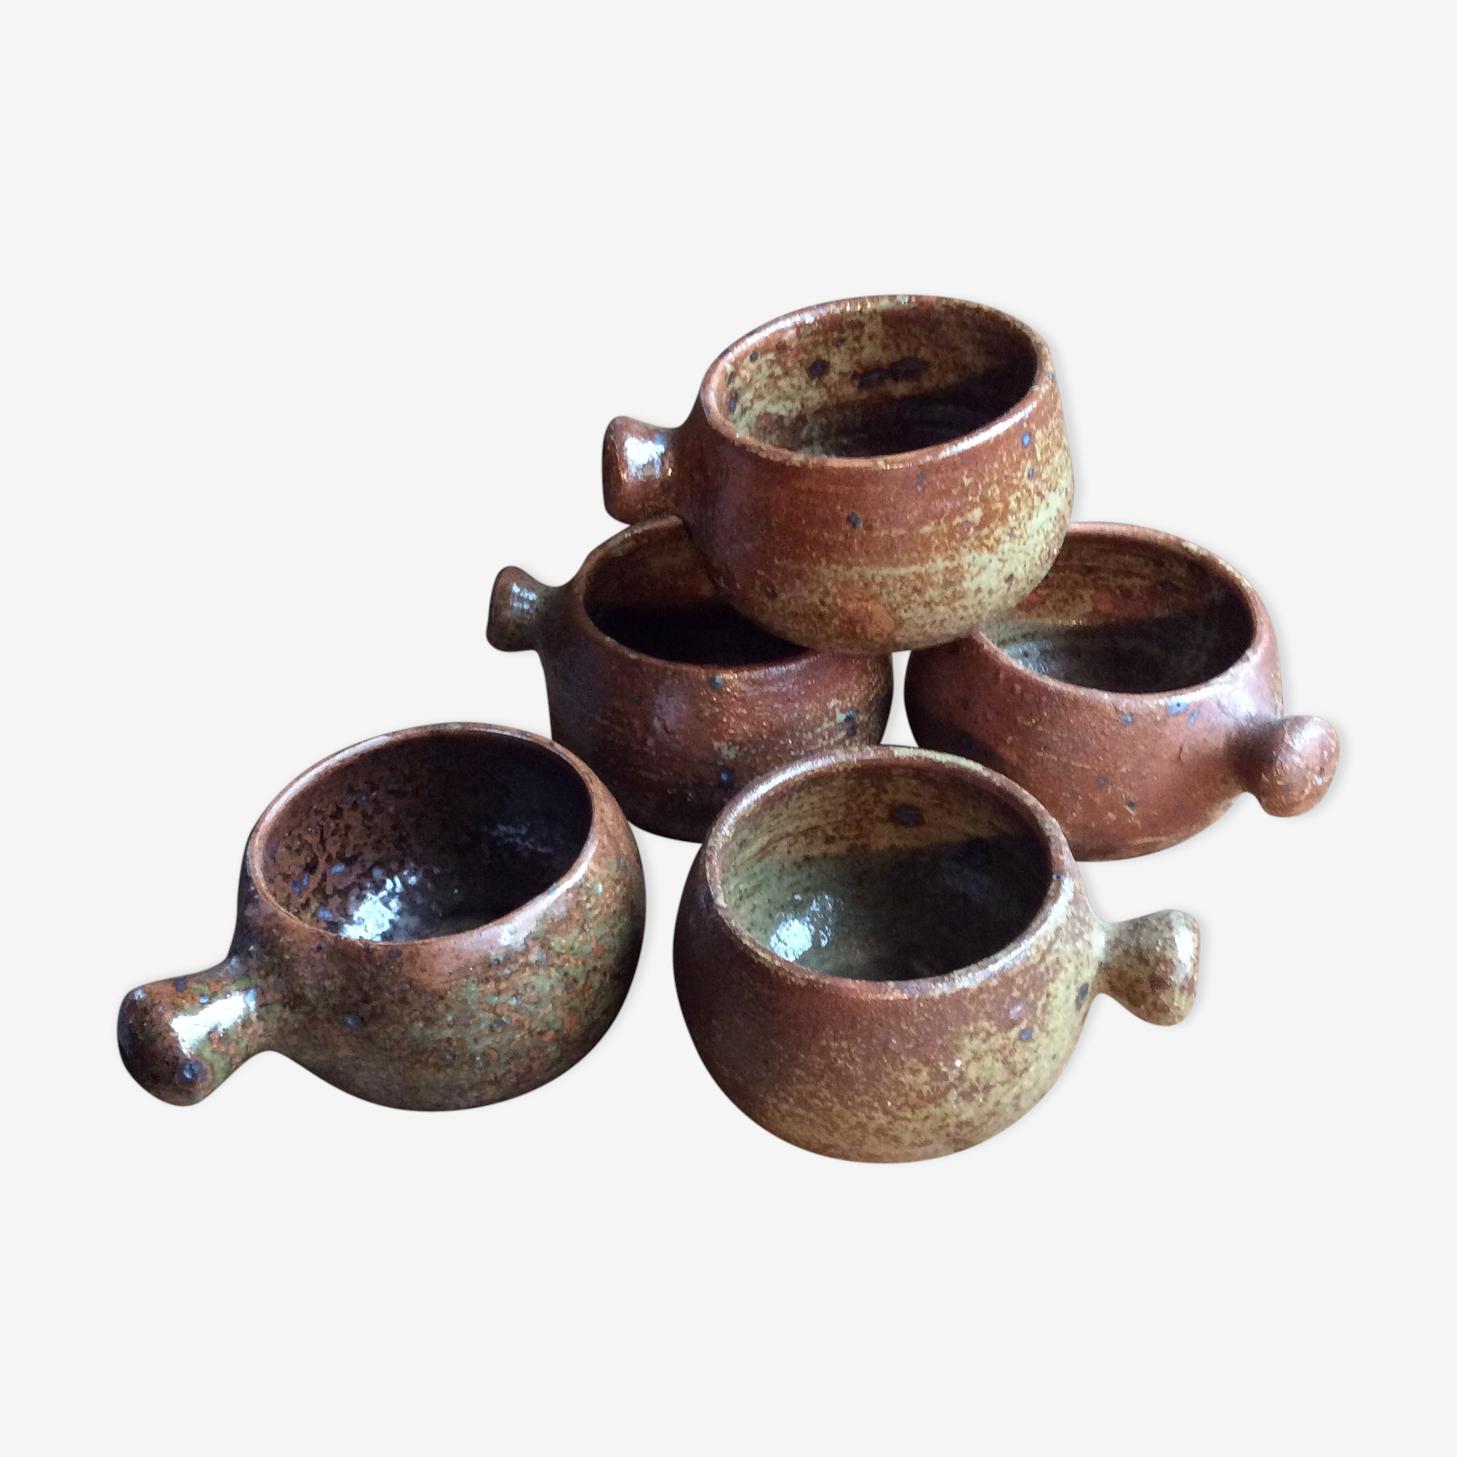 Vintage stoneware bowls